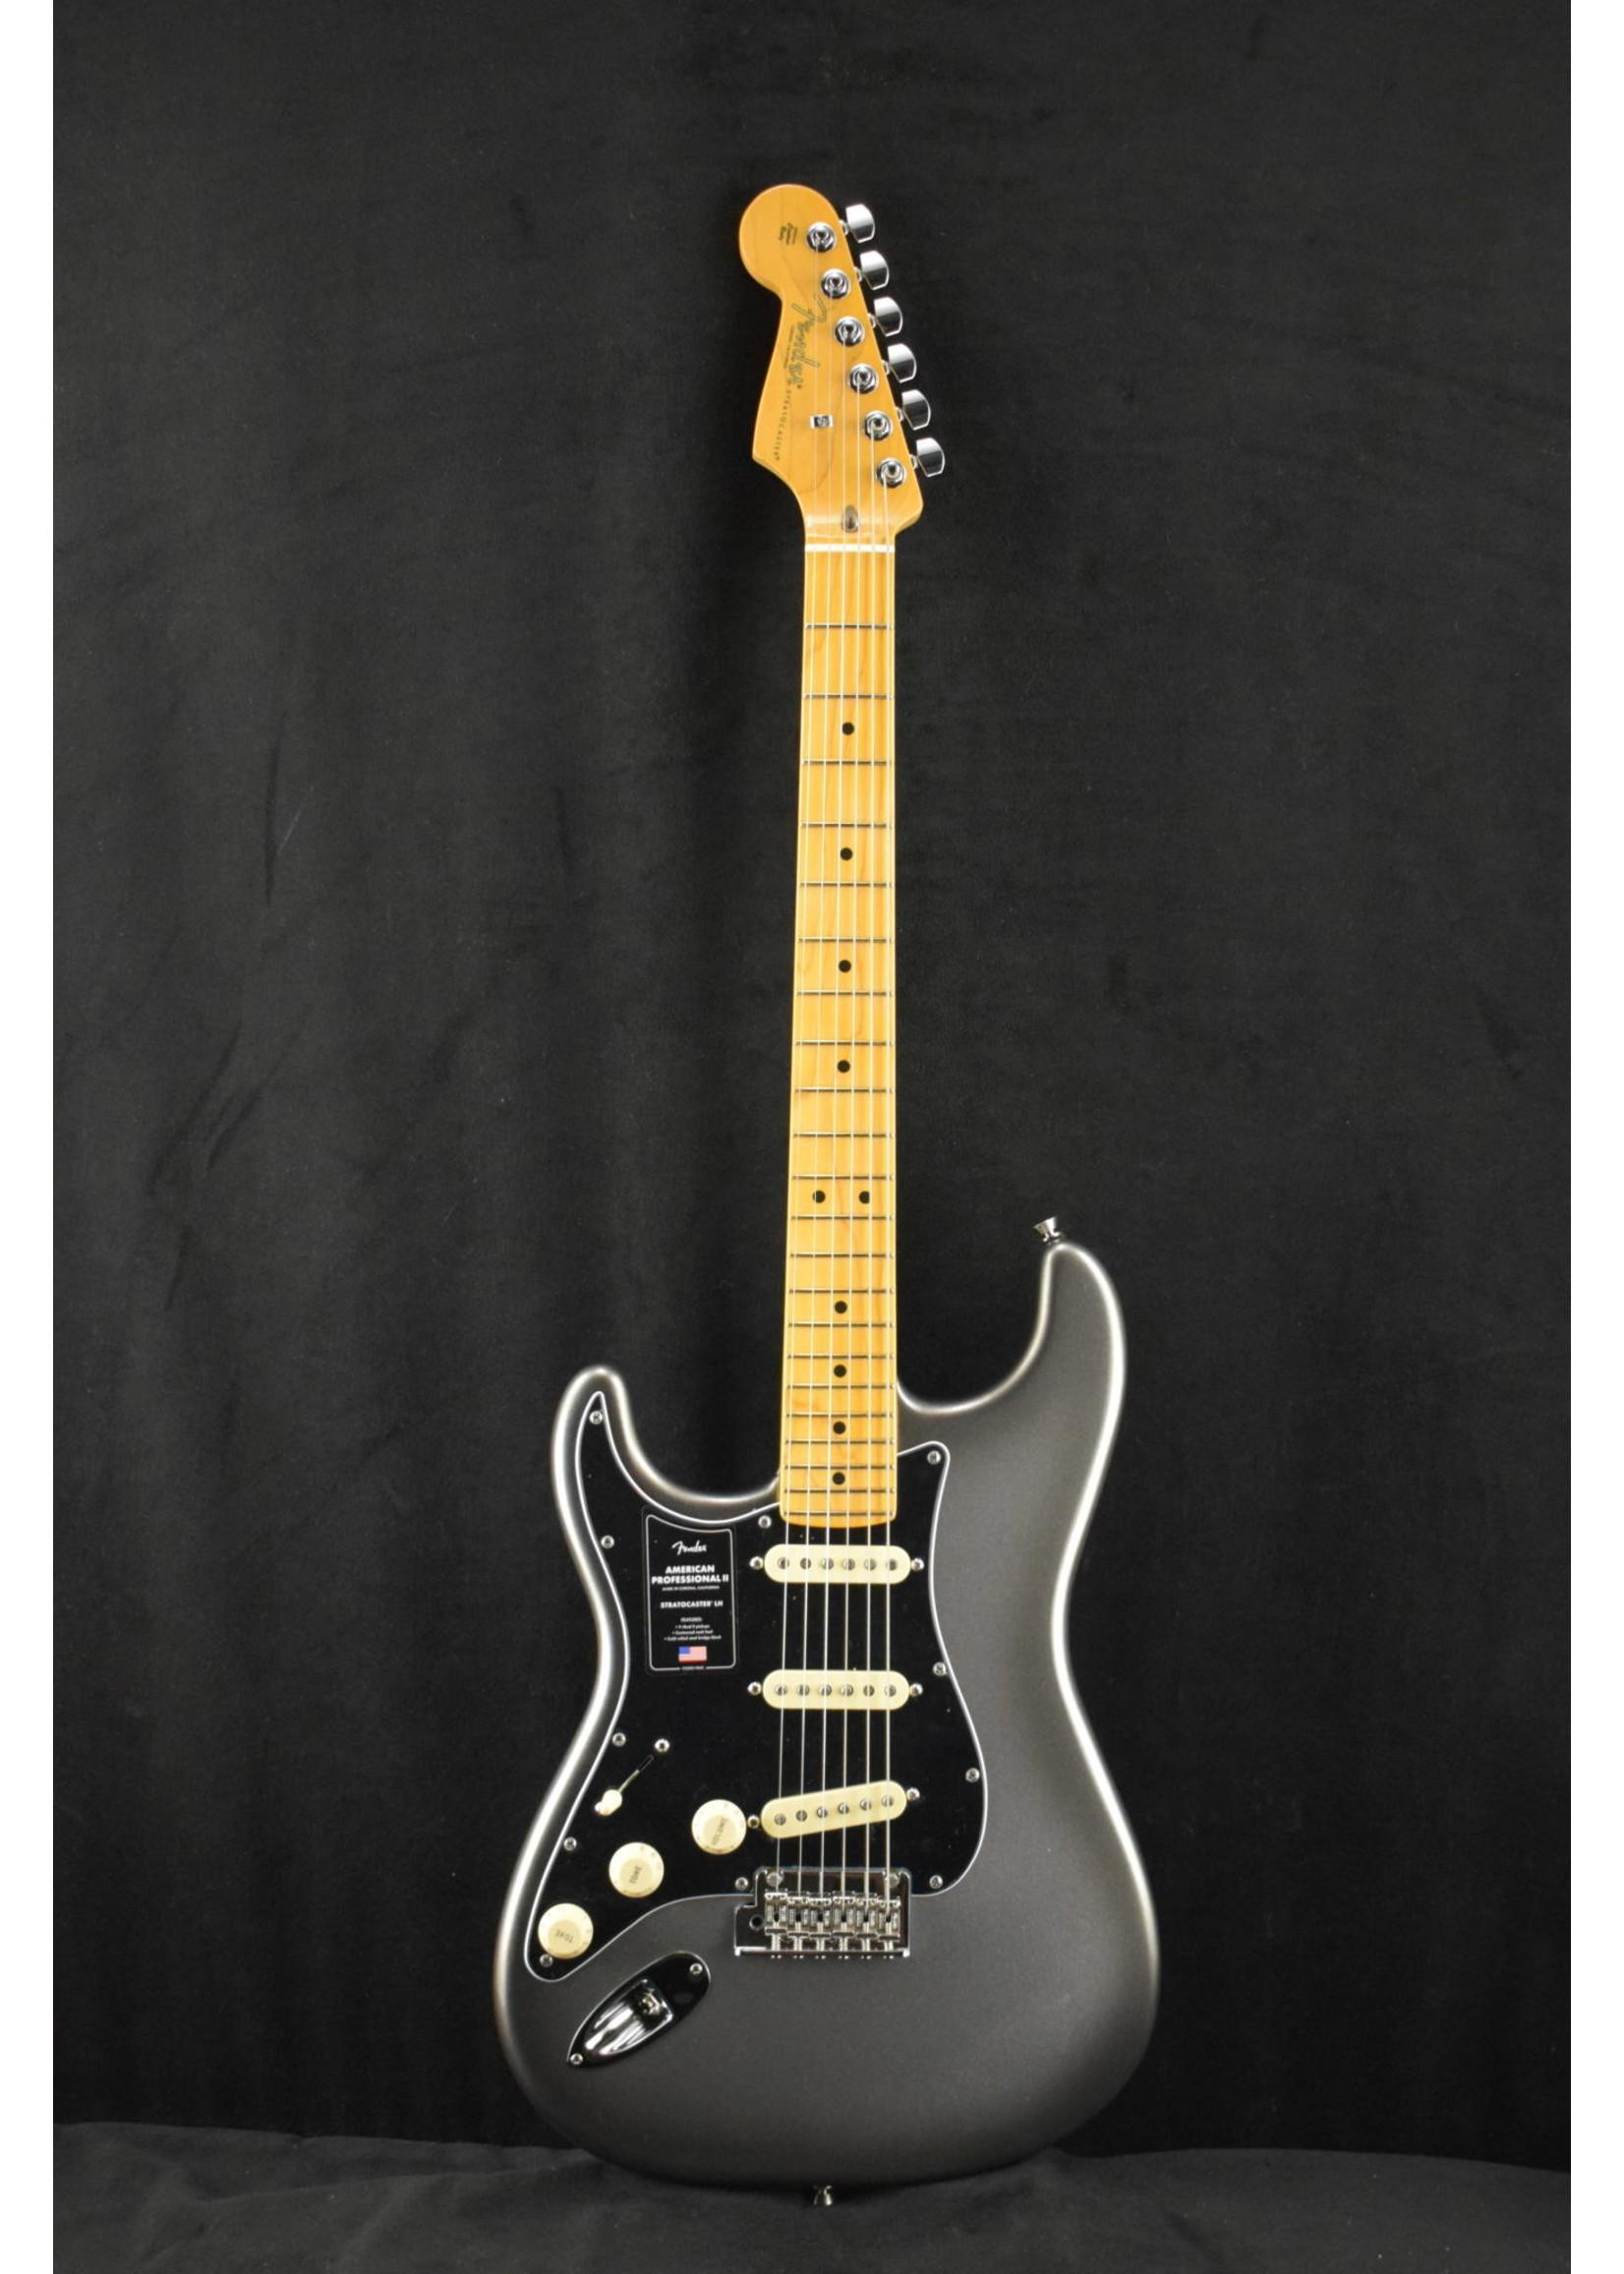 Fender Fender American Professional II Stratocaster Left-Hand Mercury Maple Fingerboard